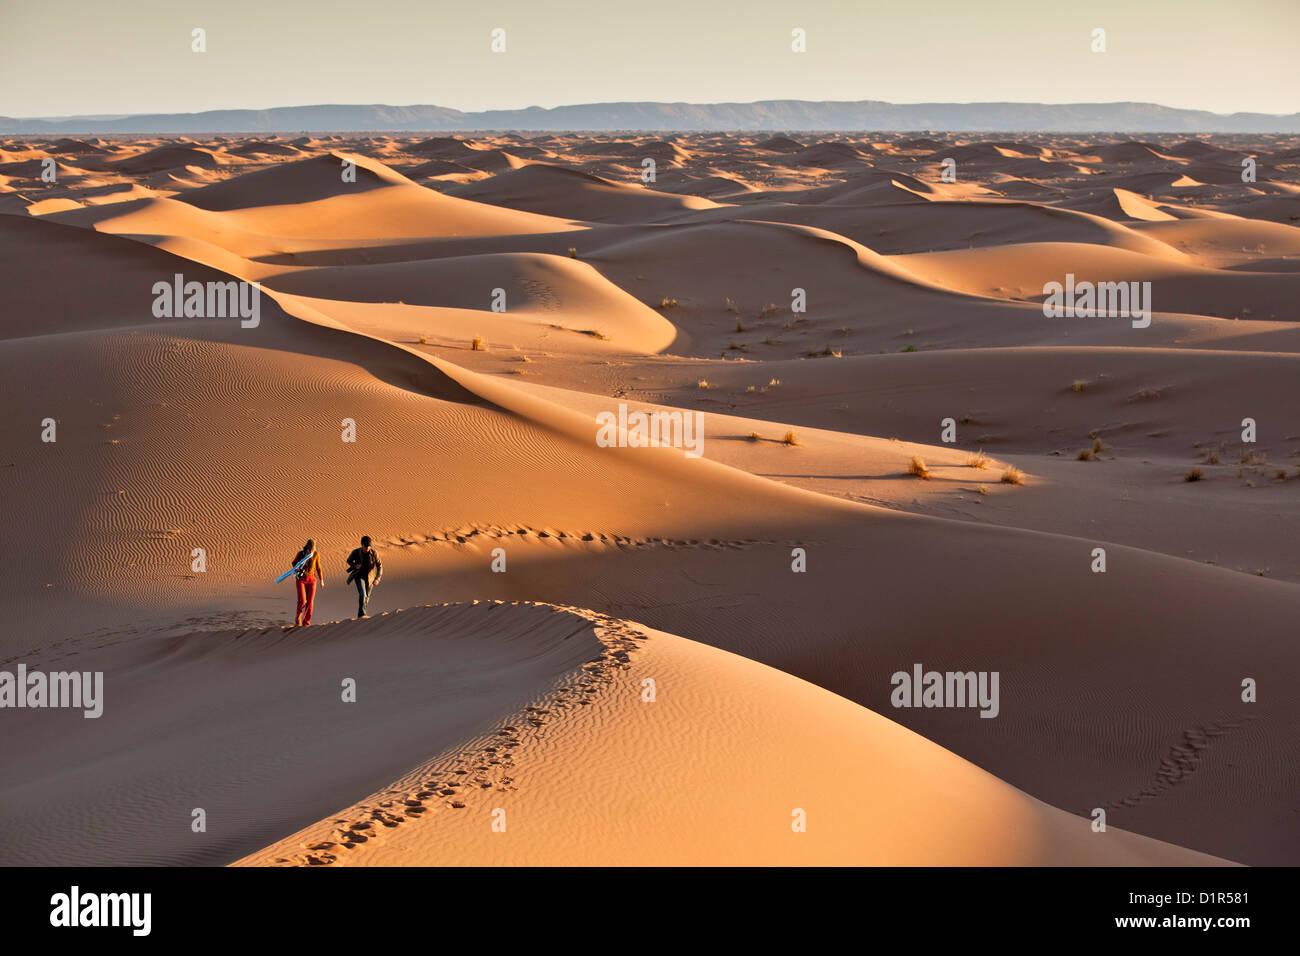 Marokko, M' Hamid, Erg Chigaga Dünen. Wüste Sahara. Touristen auf der Sanddüne. Stockbild